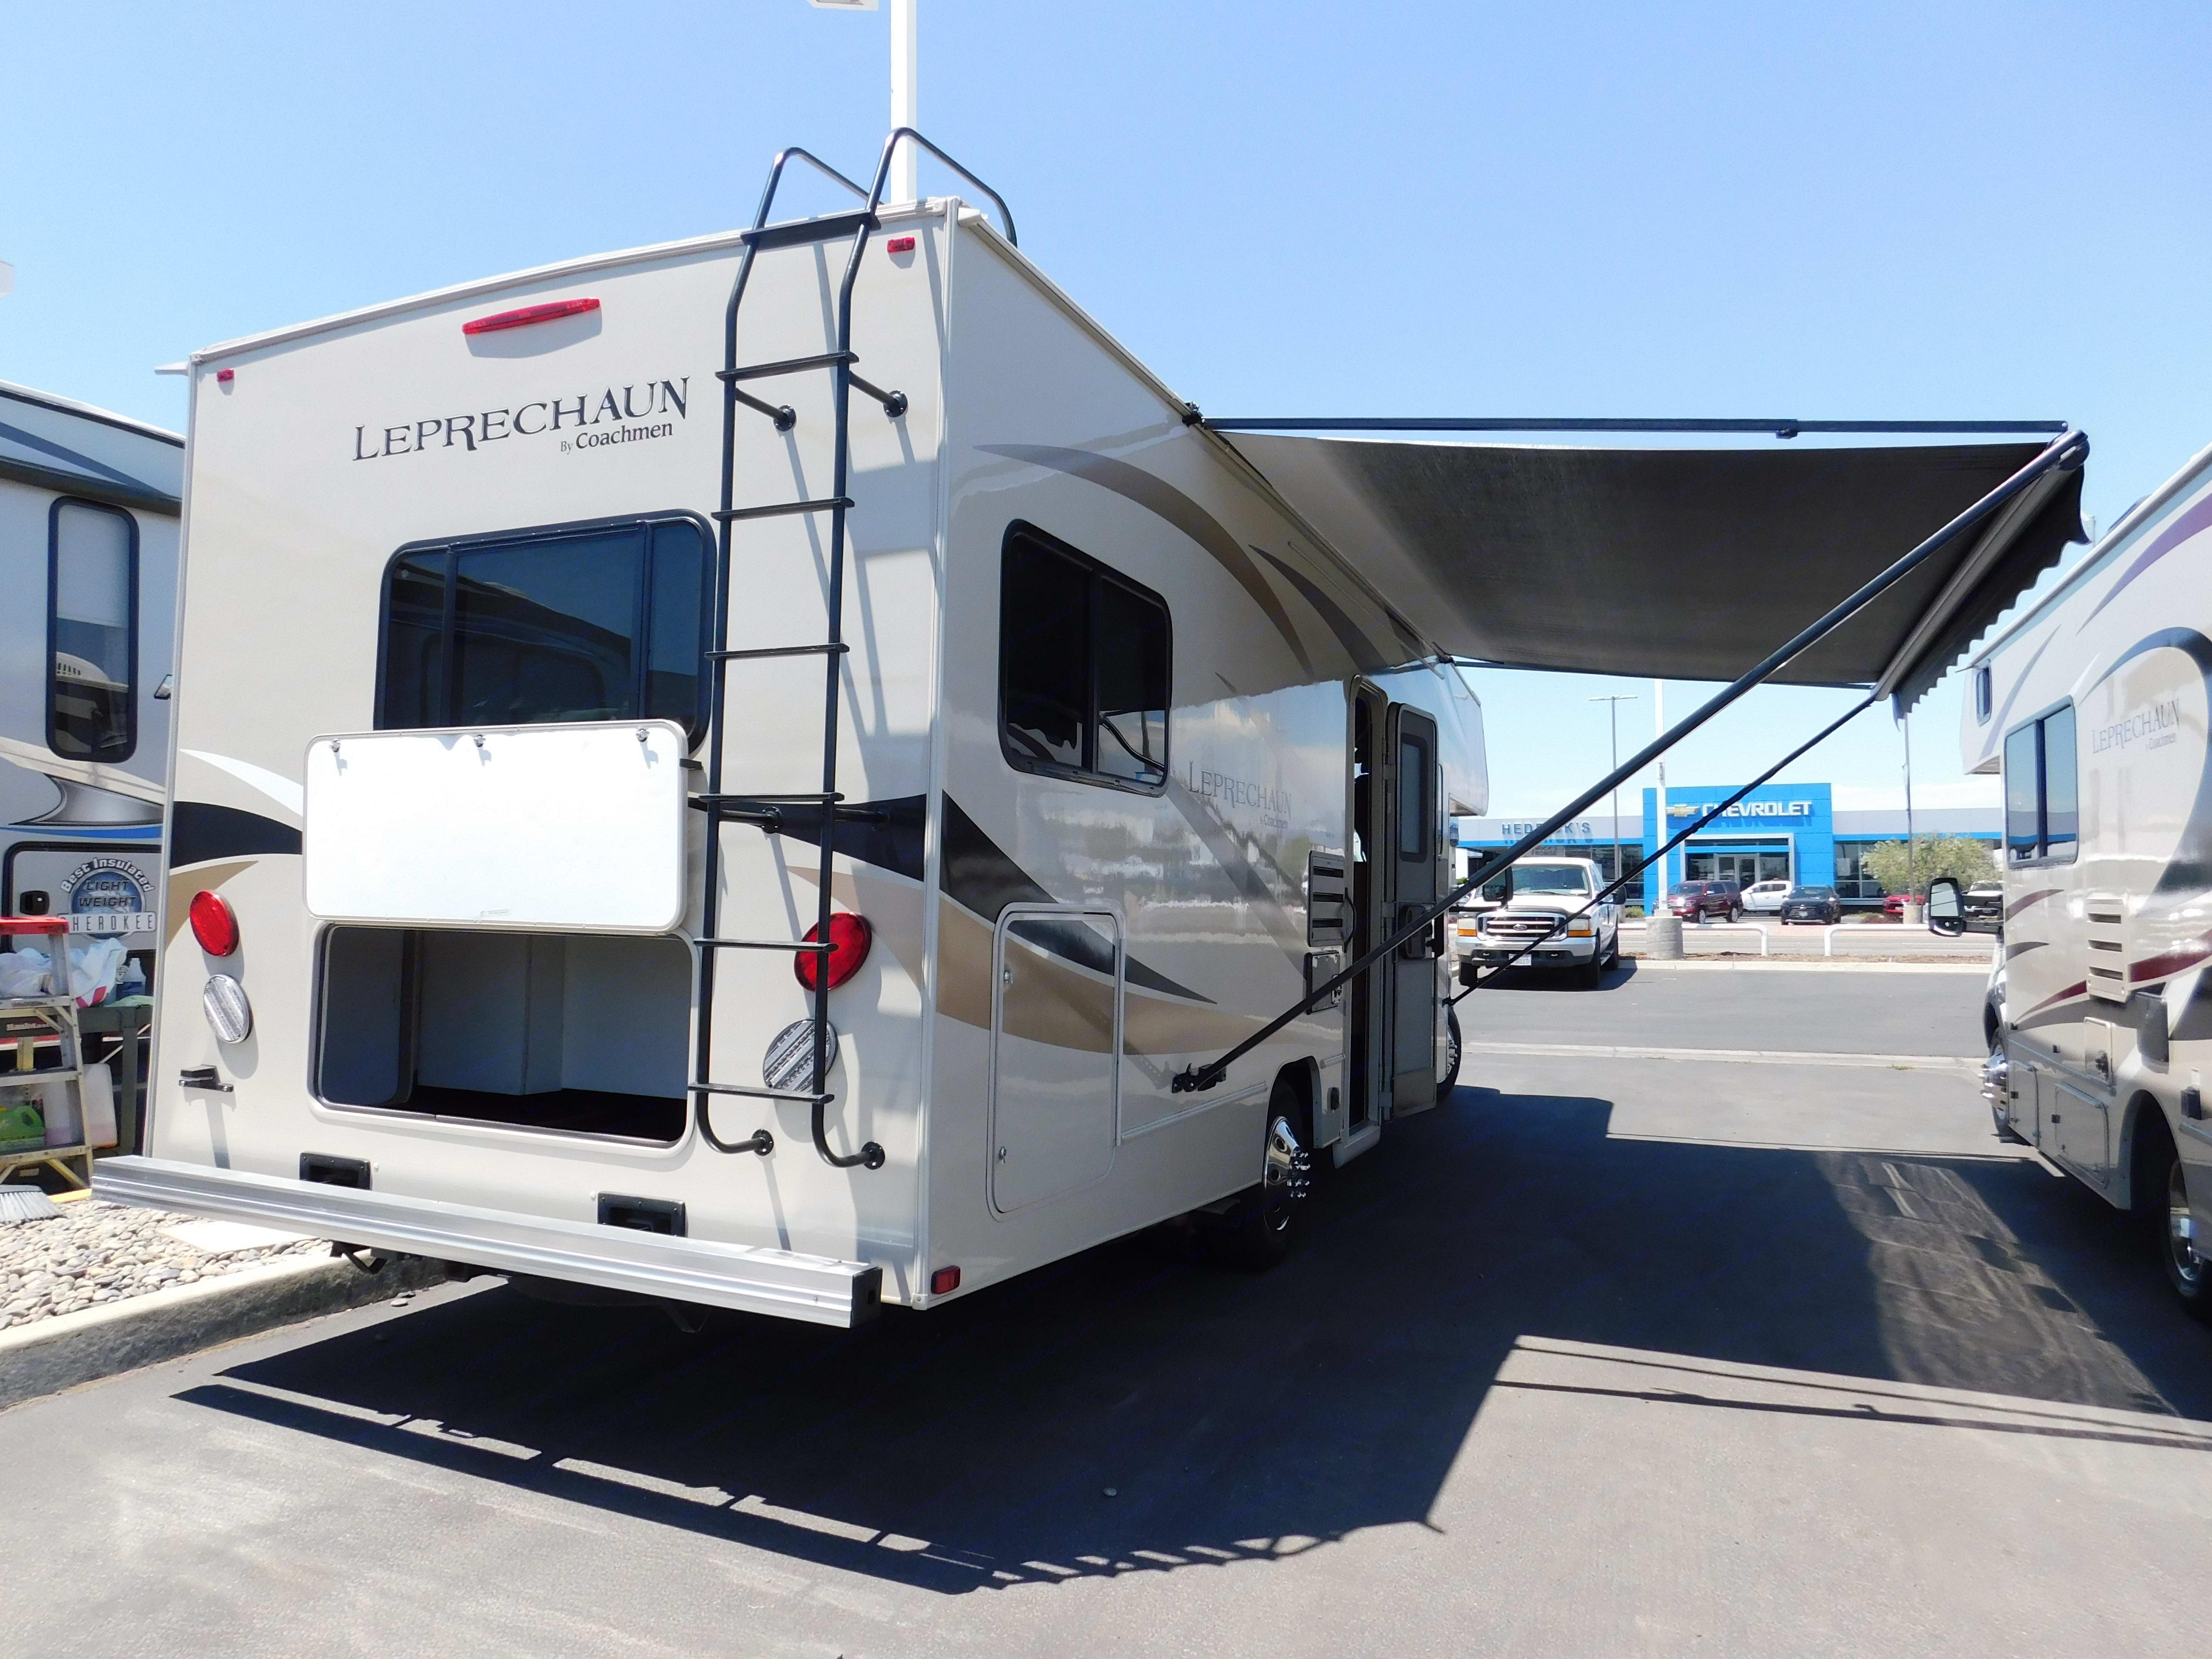 Coachmen Leprechaun 260 class c motorhome 2019